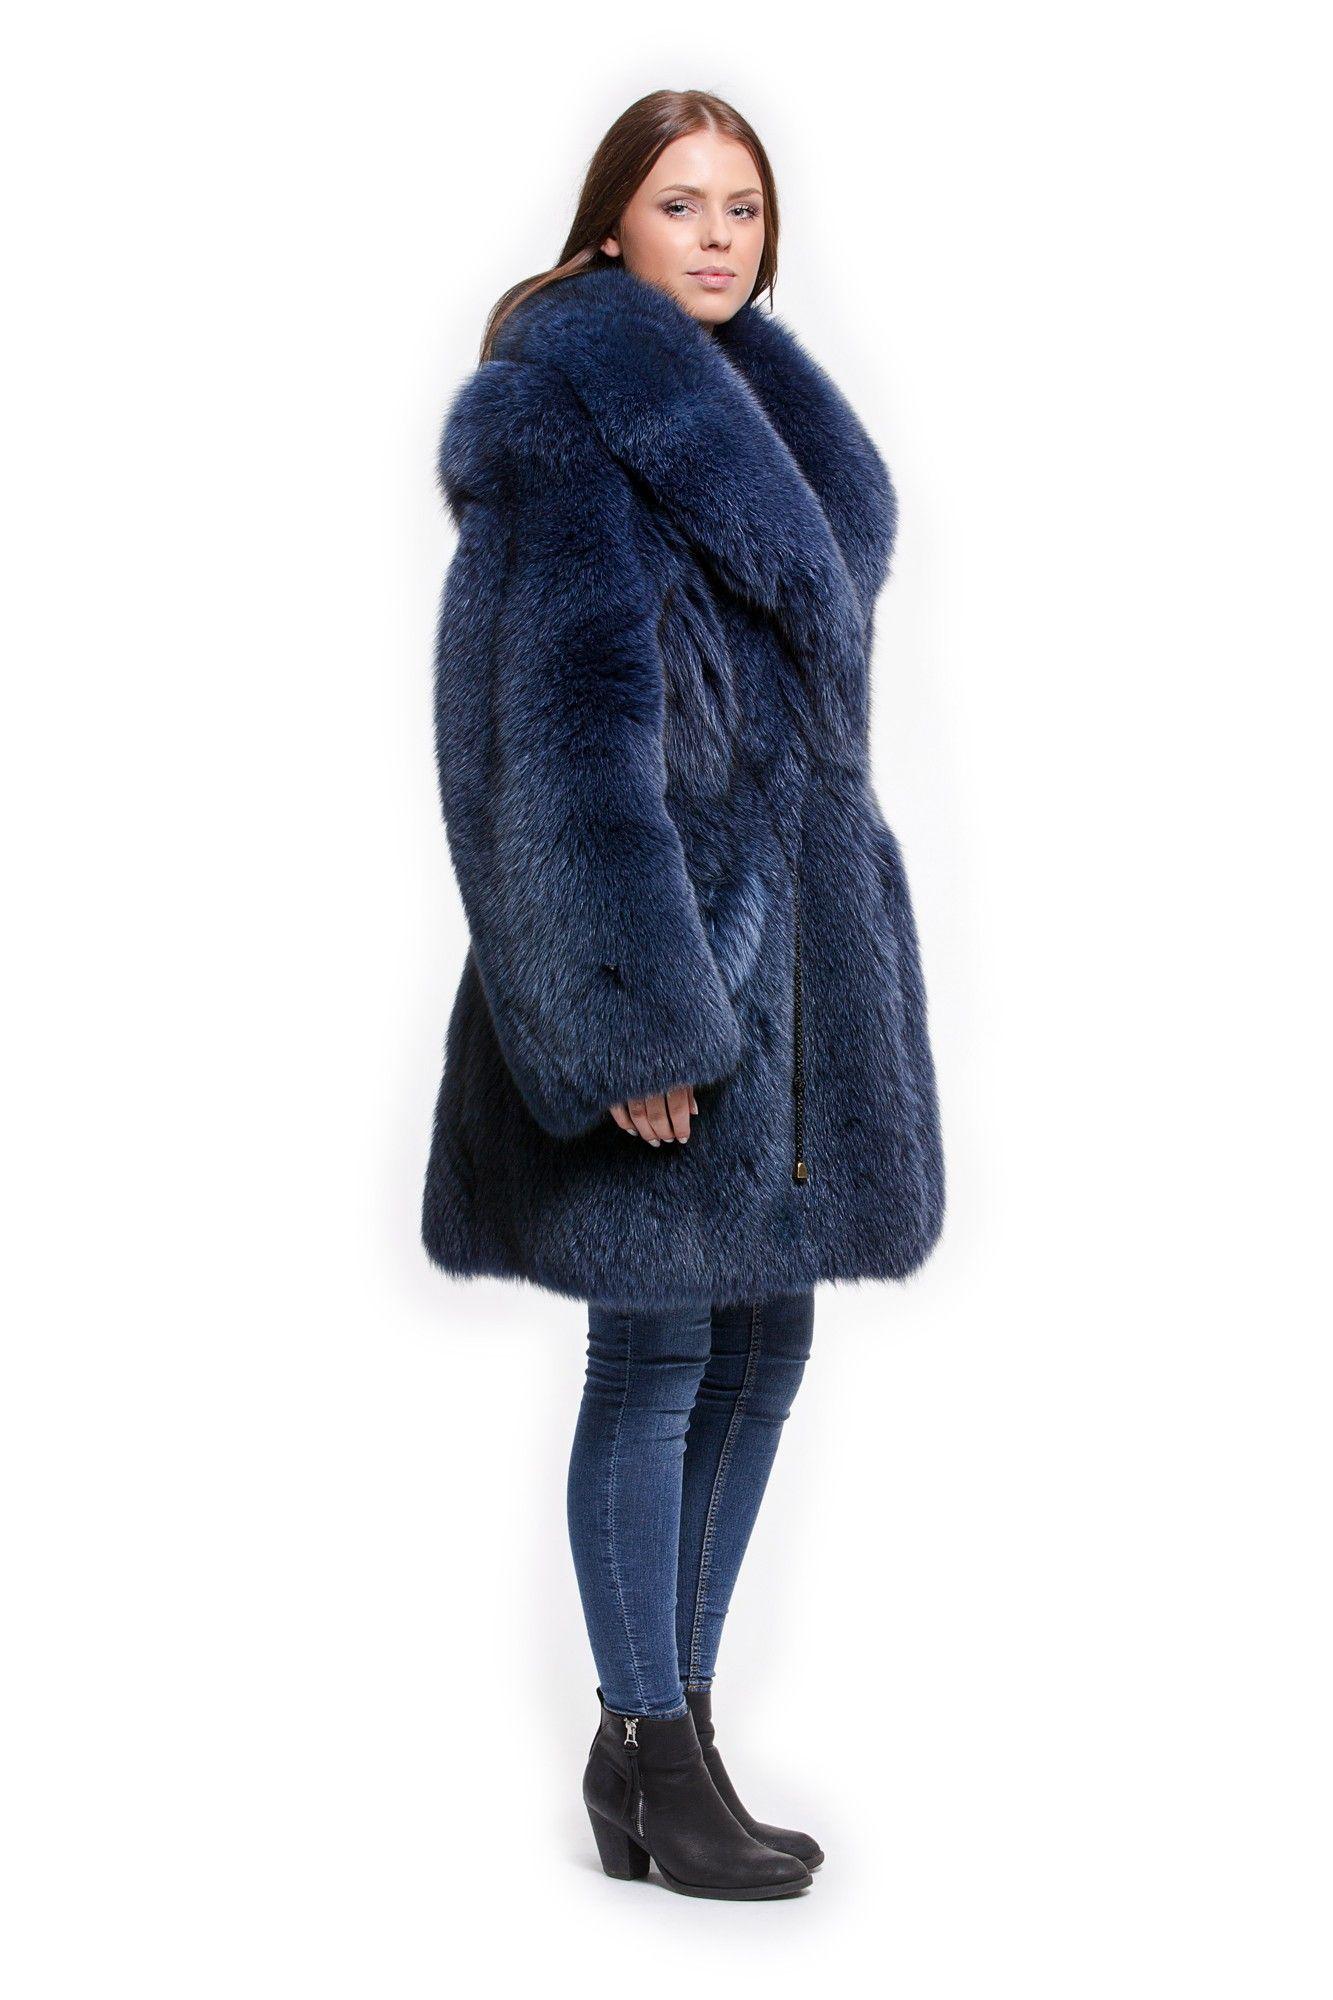 Felljacke Blaufuchs Jacke in blau schöne weiche Pelzjacke kaufen ...